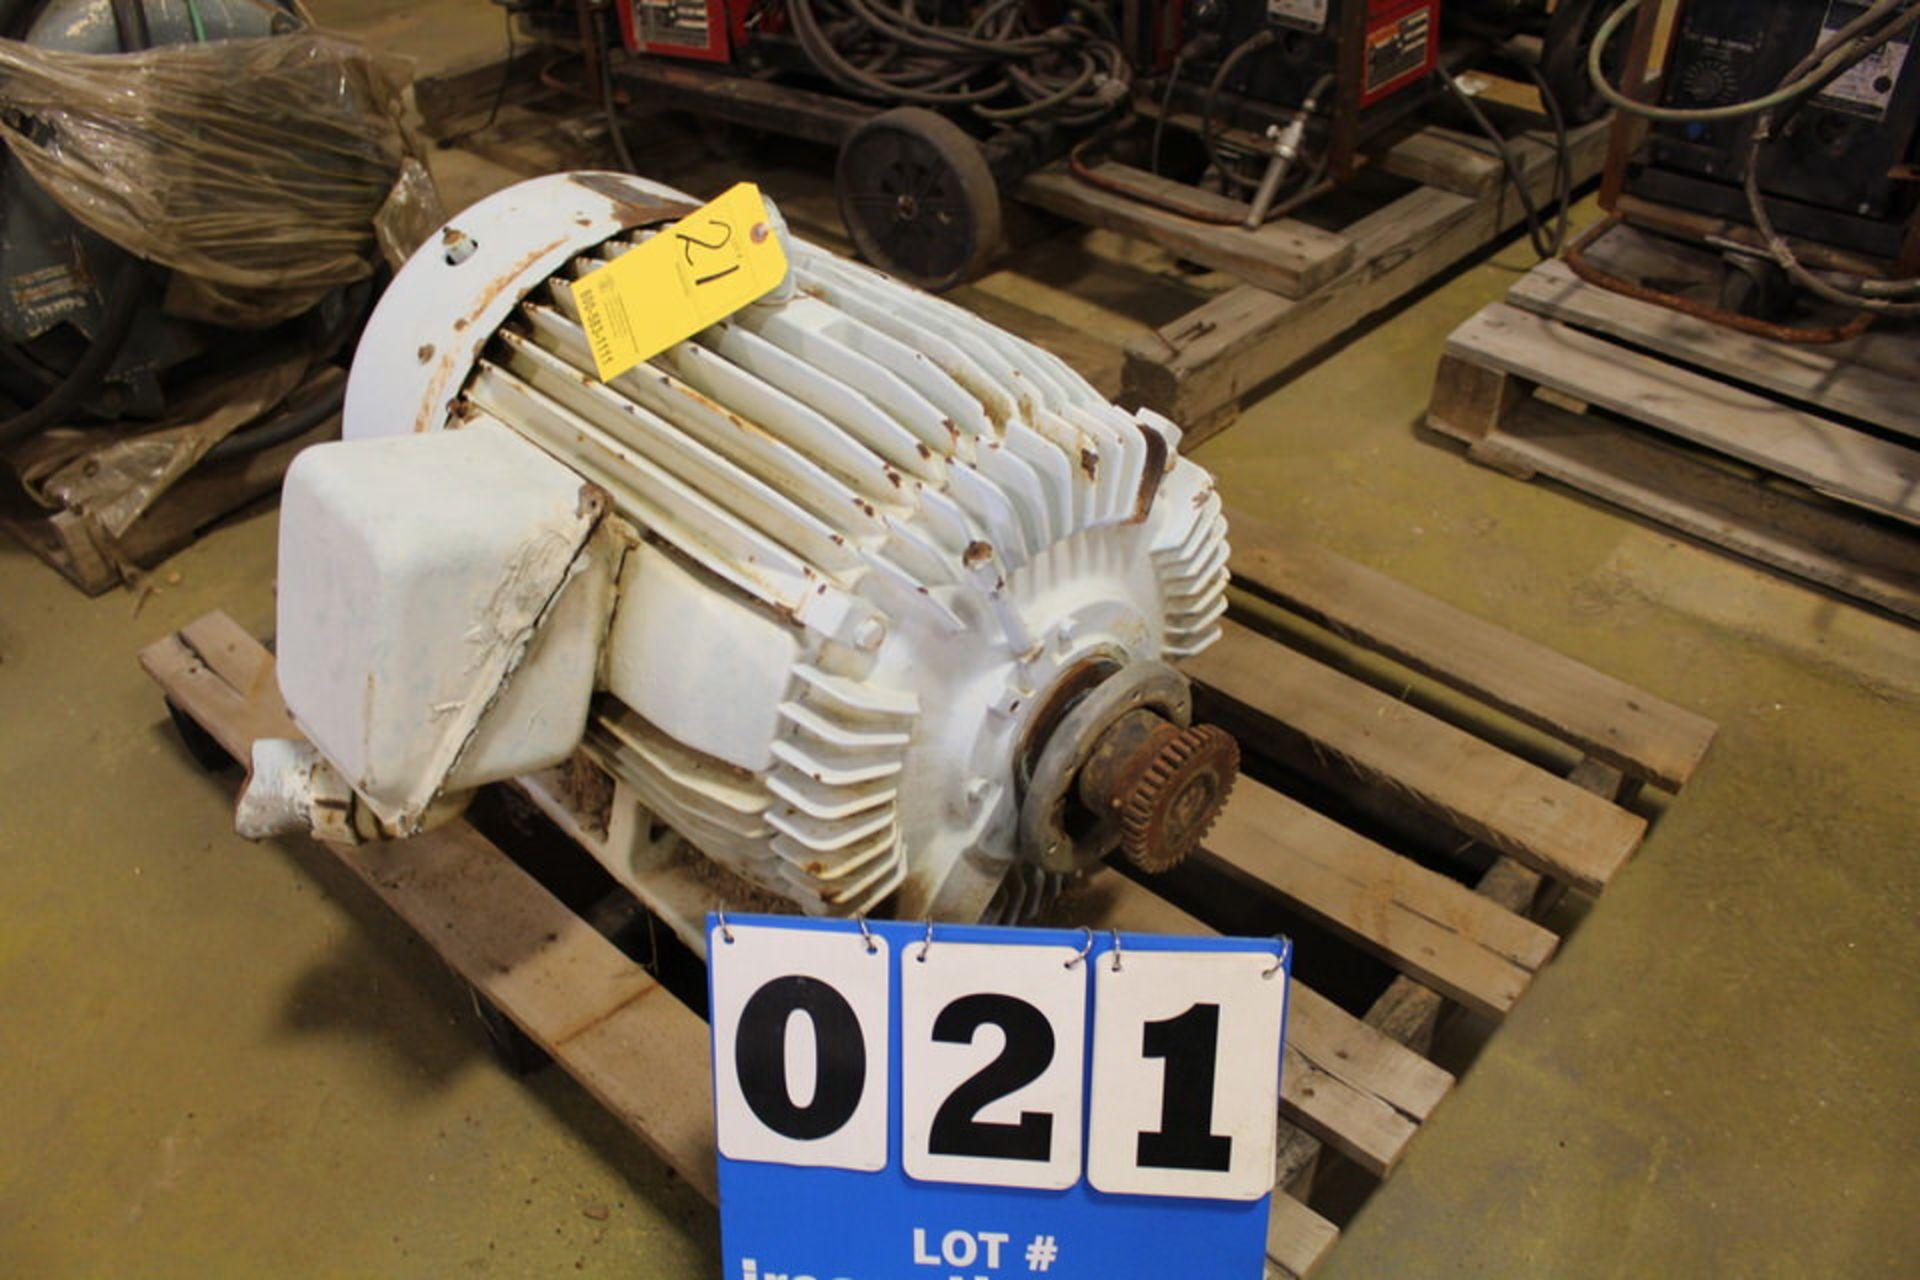 Lot 21 - LEESON 75HP MOTOR (LOCATION: 4081 EASTSIDE HWY, STEVENSVILLE, MT, 59870)